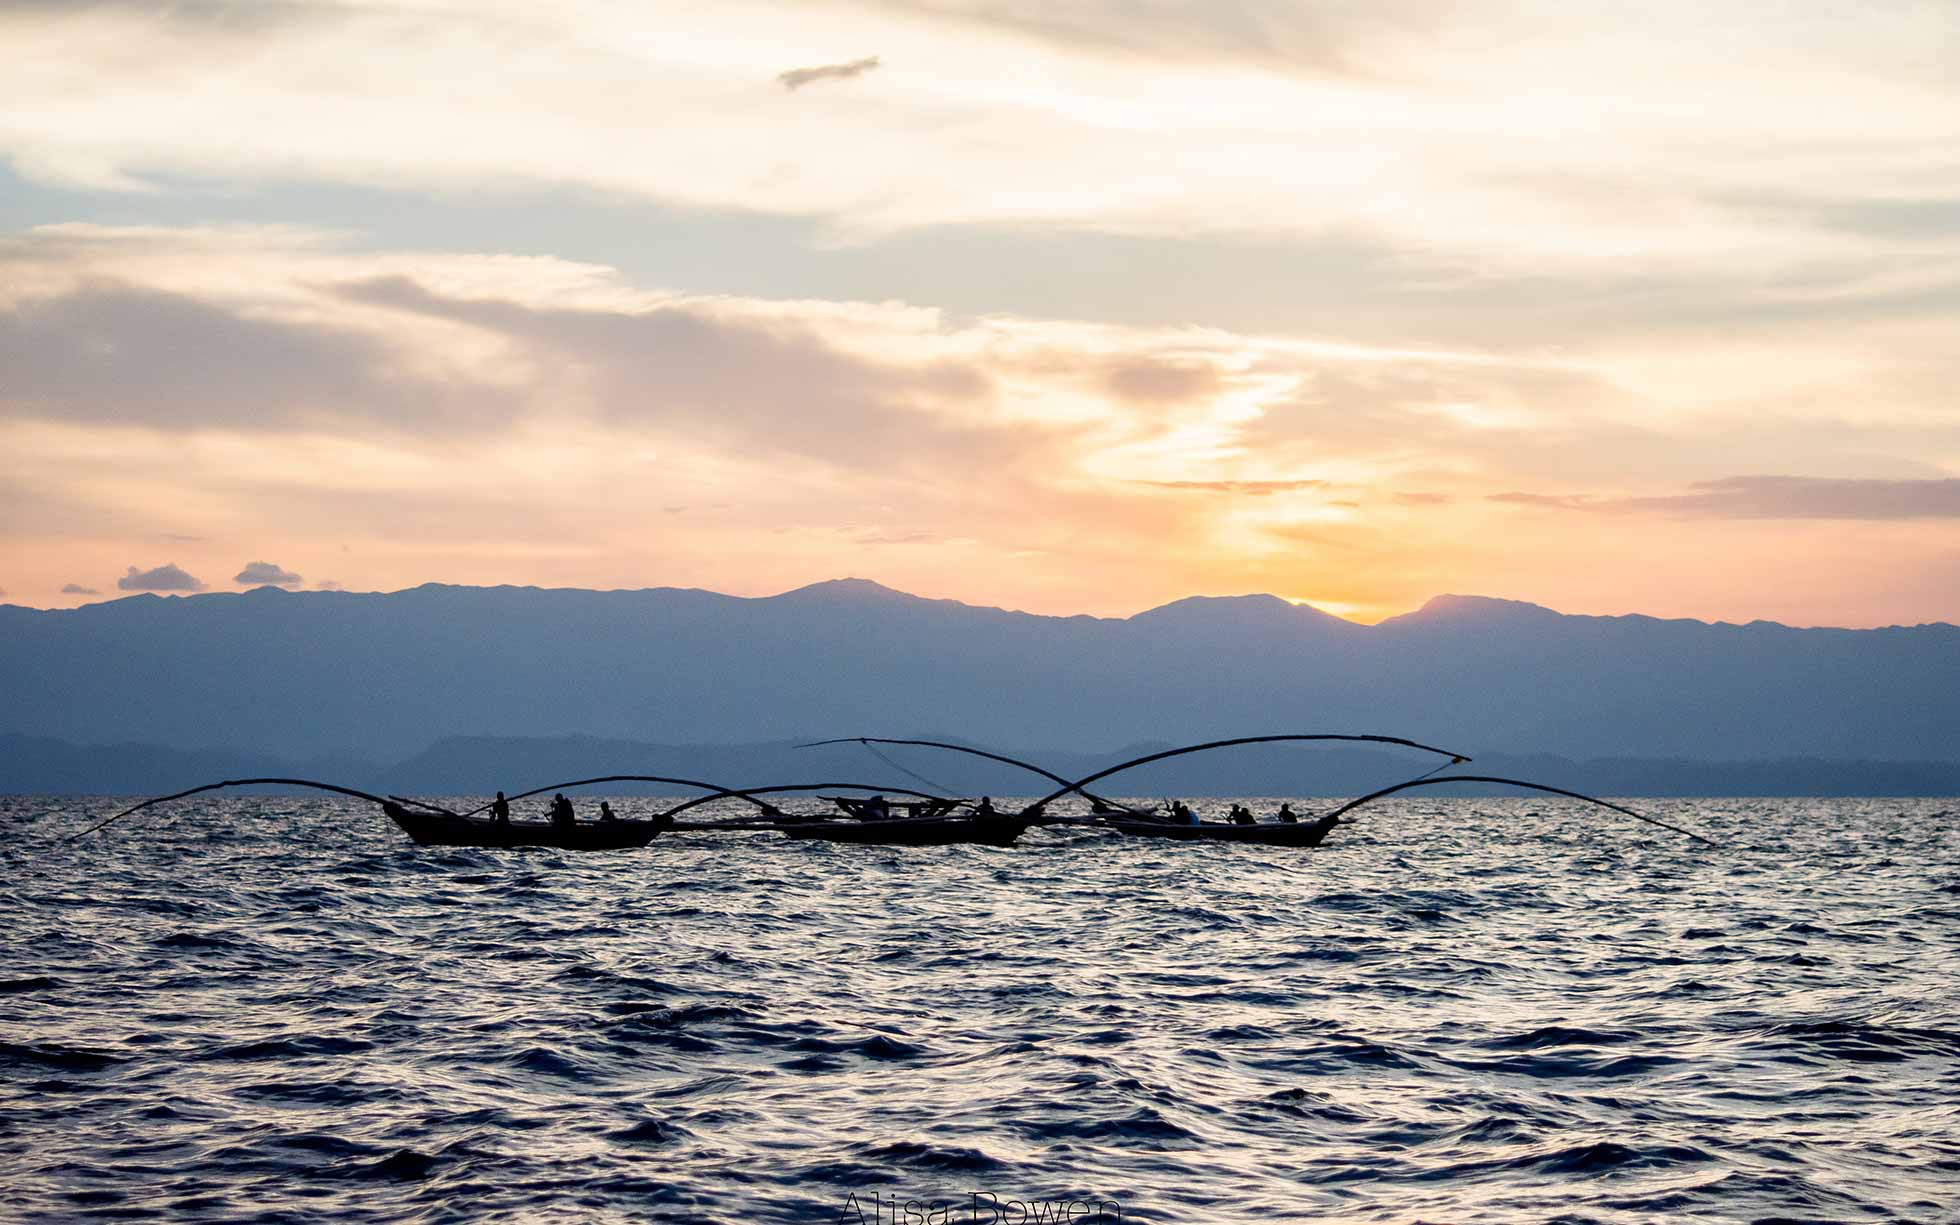 enkosi-africa-safari-rwanda-lake-kivu-serena-hotel-view-